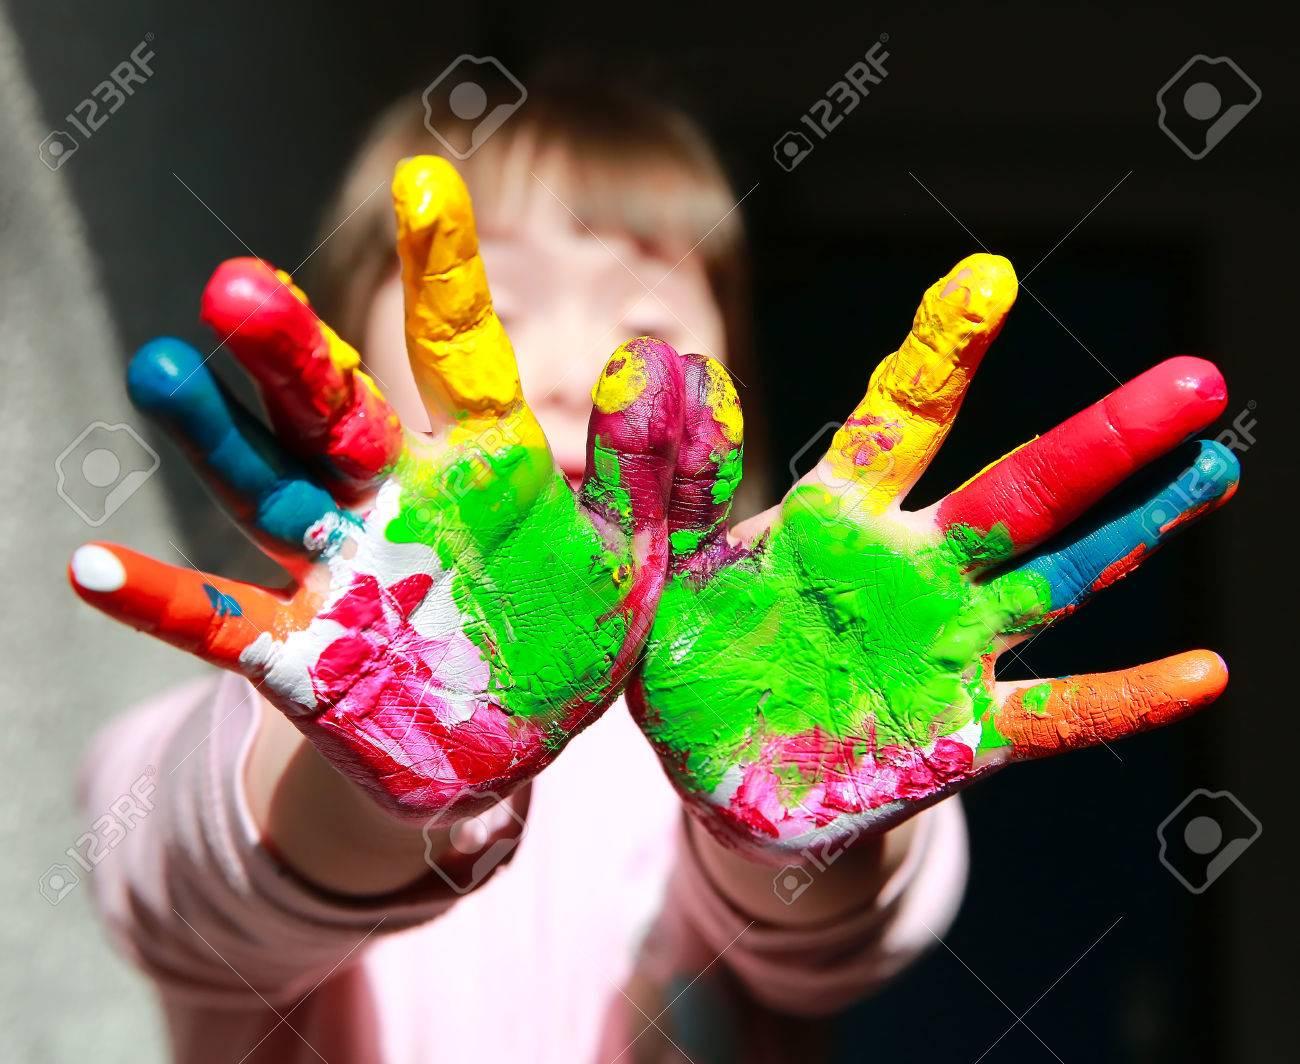 Cute little kid with painted hands Standard-Bild - 63018501